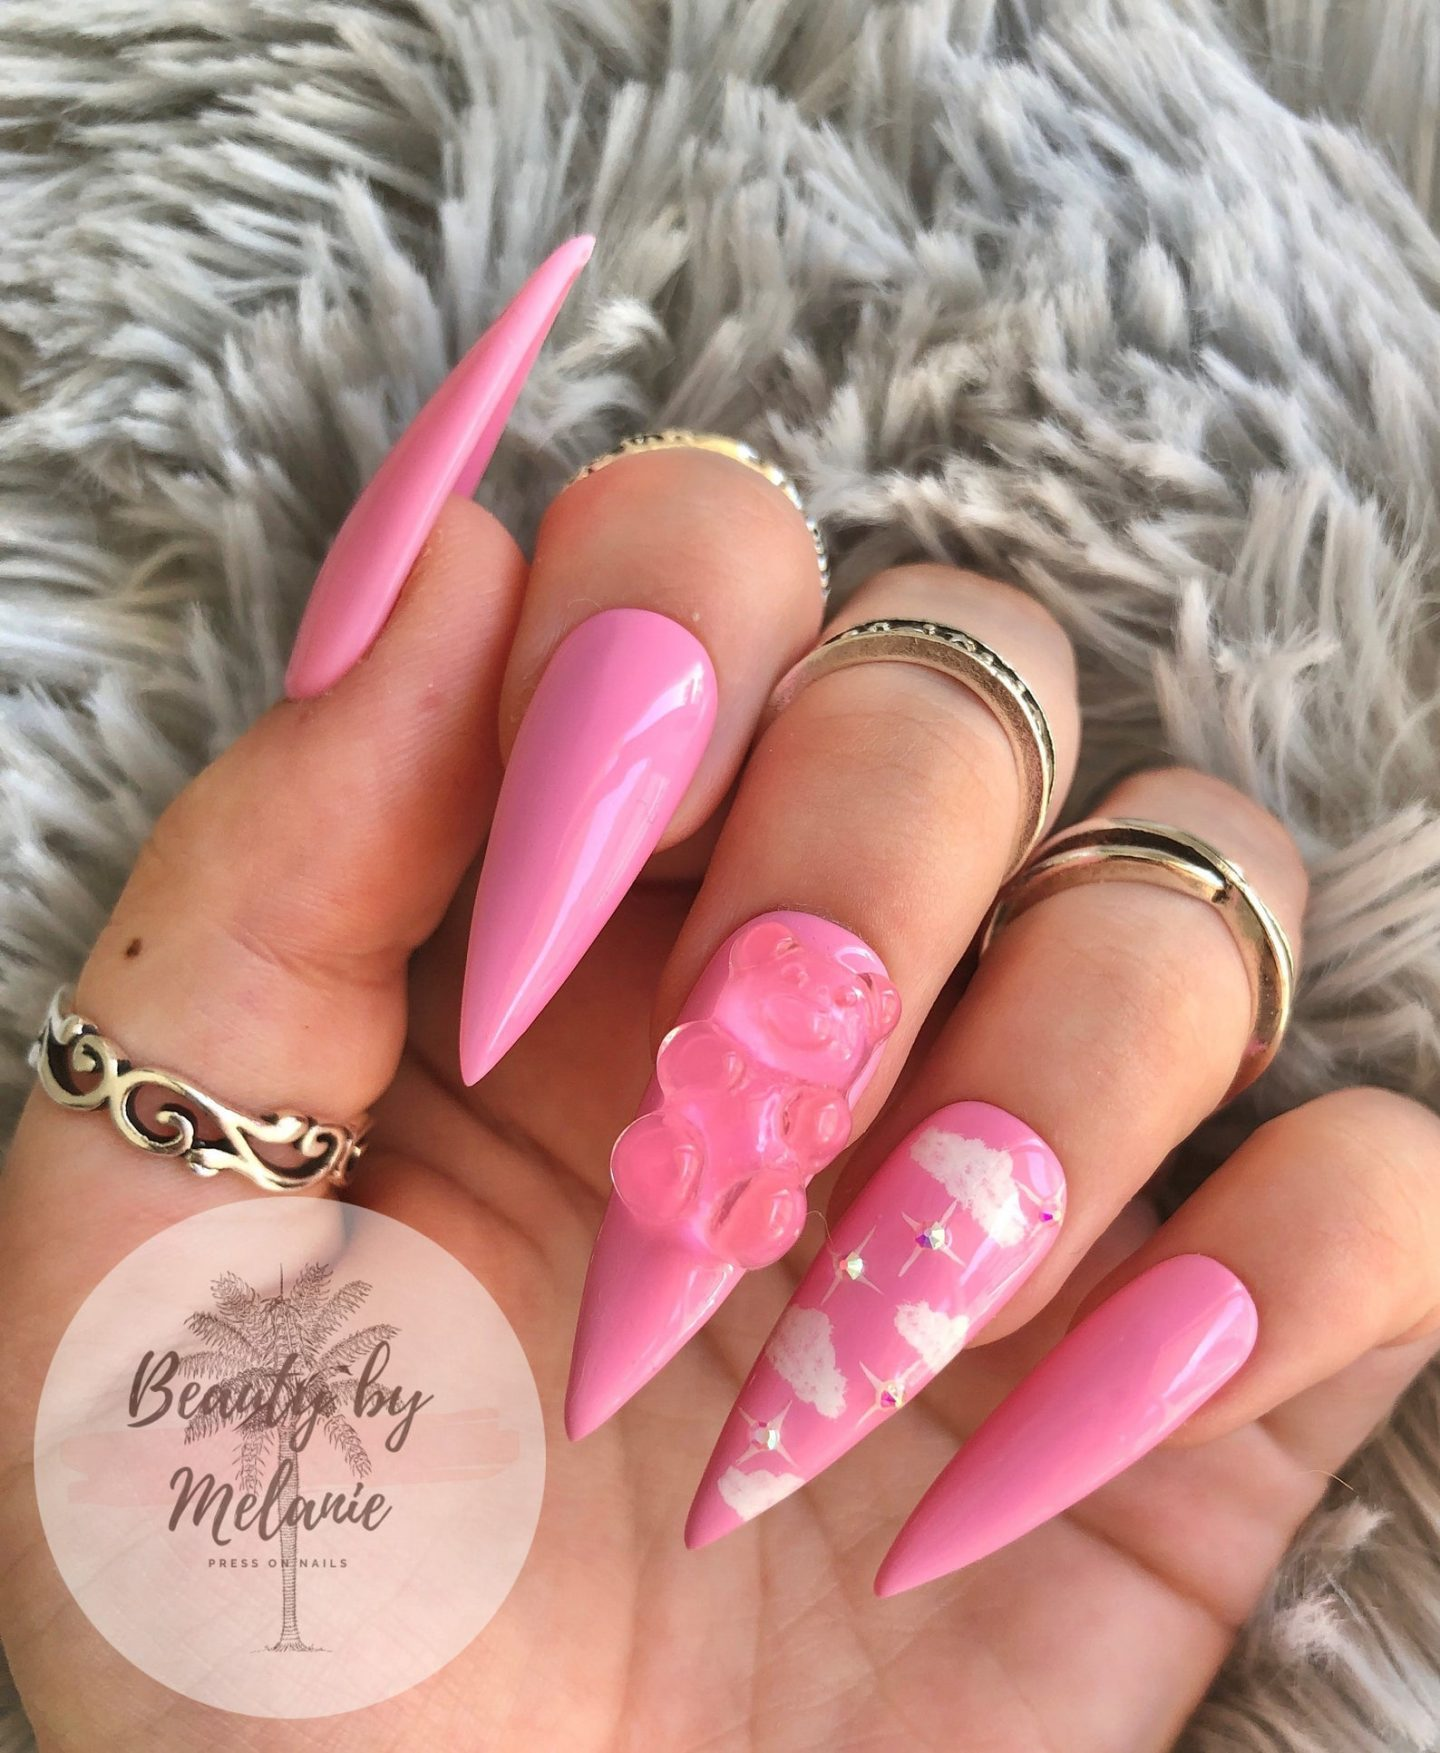 Pink gummy bear nails in acrylic stiletto shape